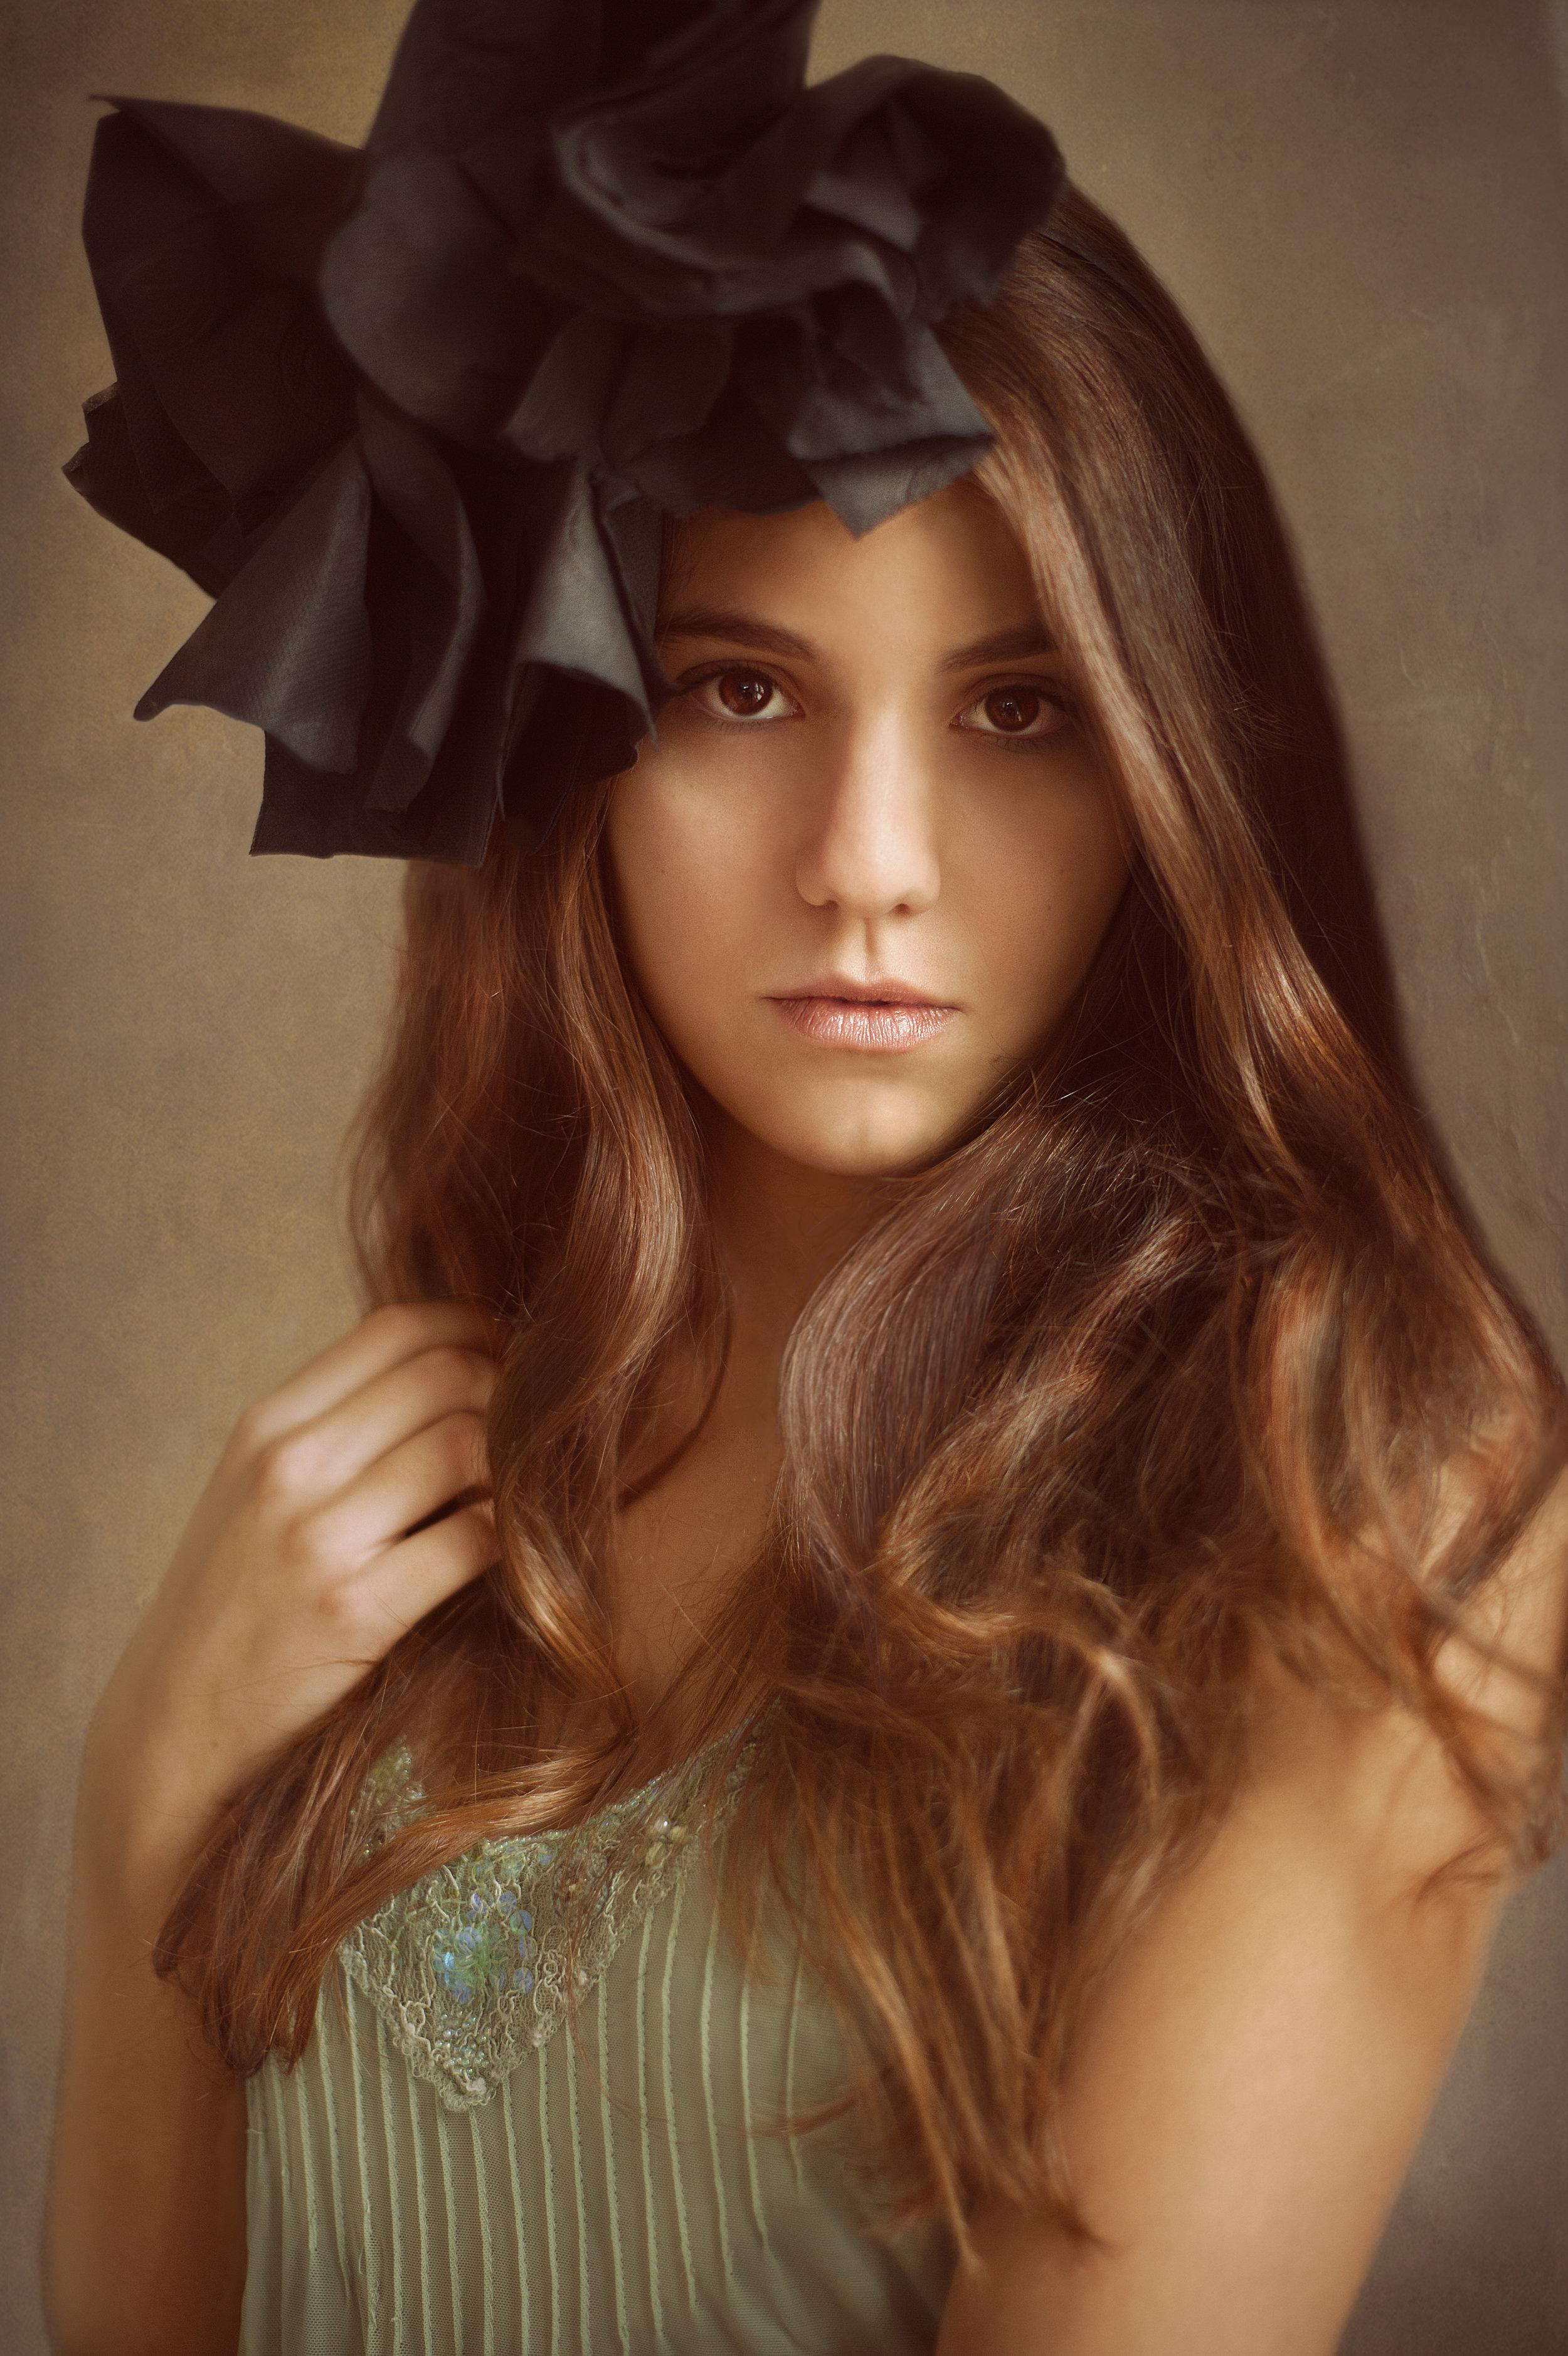 Marta Hewson Portraits - girl with  black flower in her hair.jpg